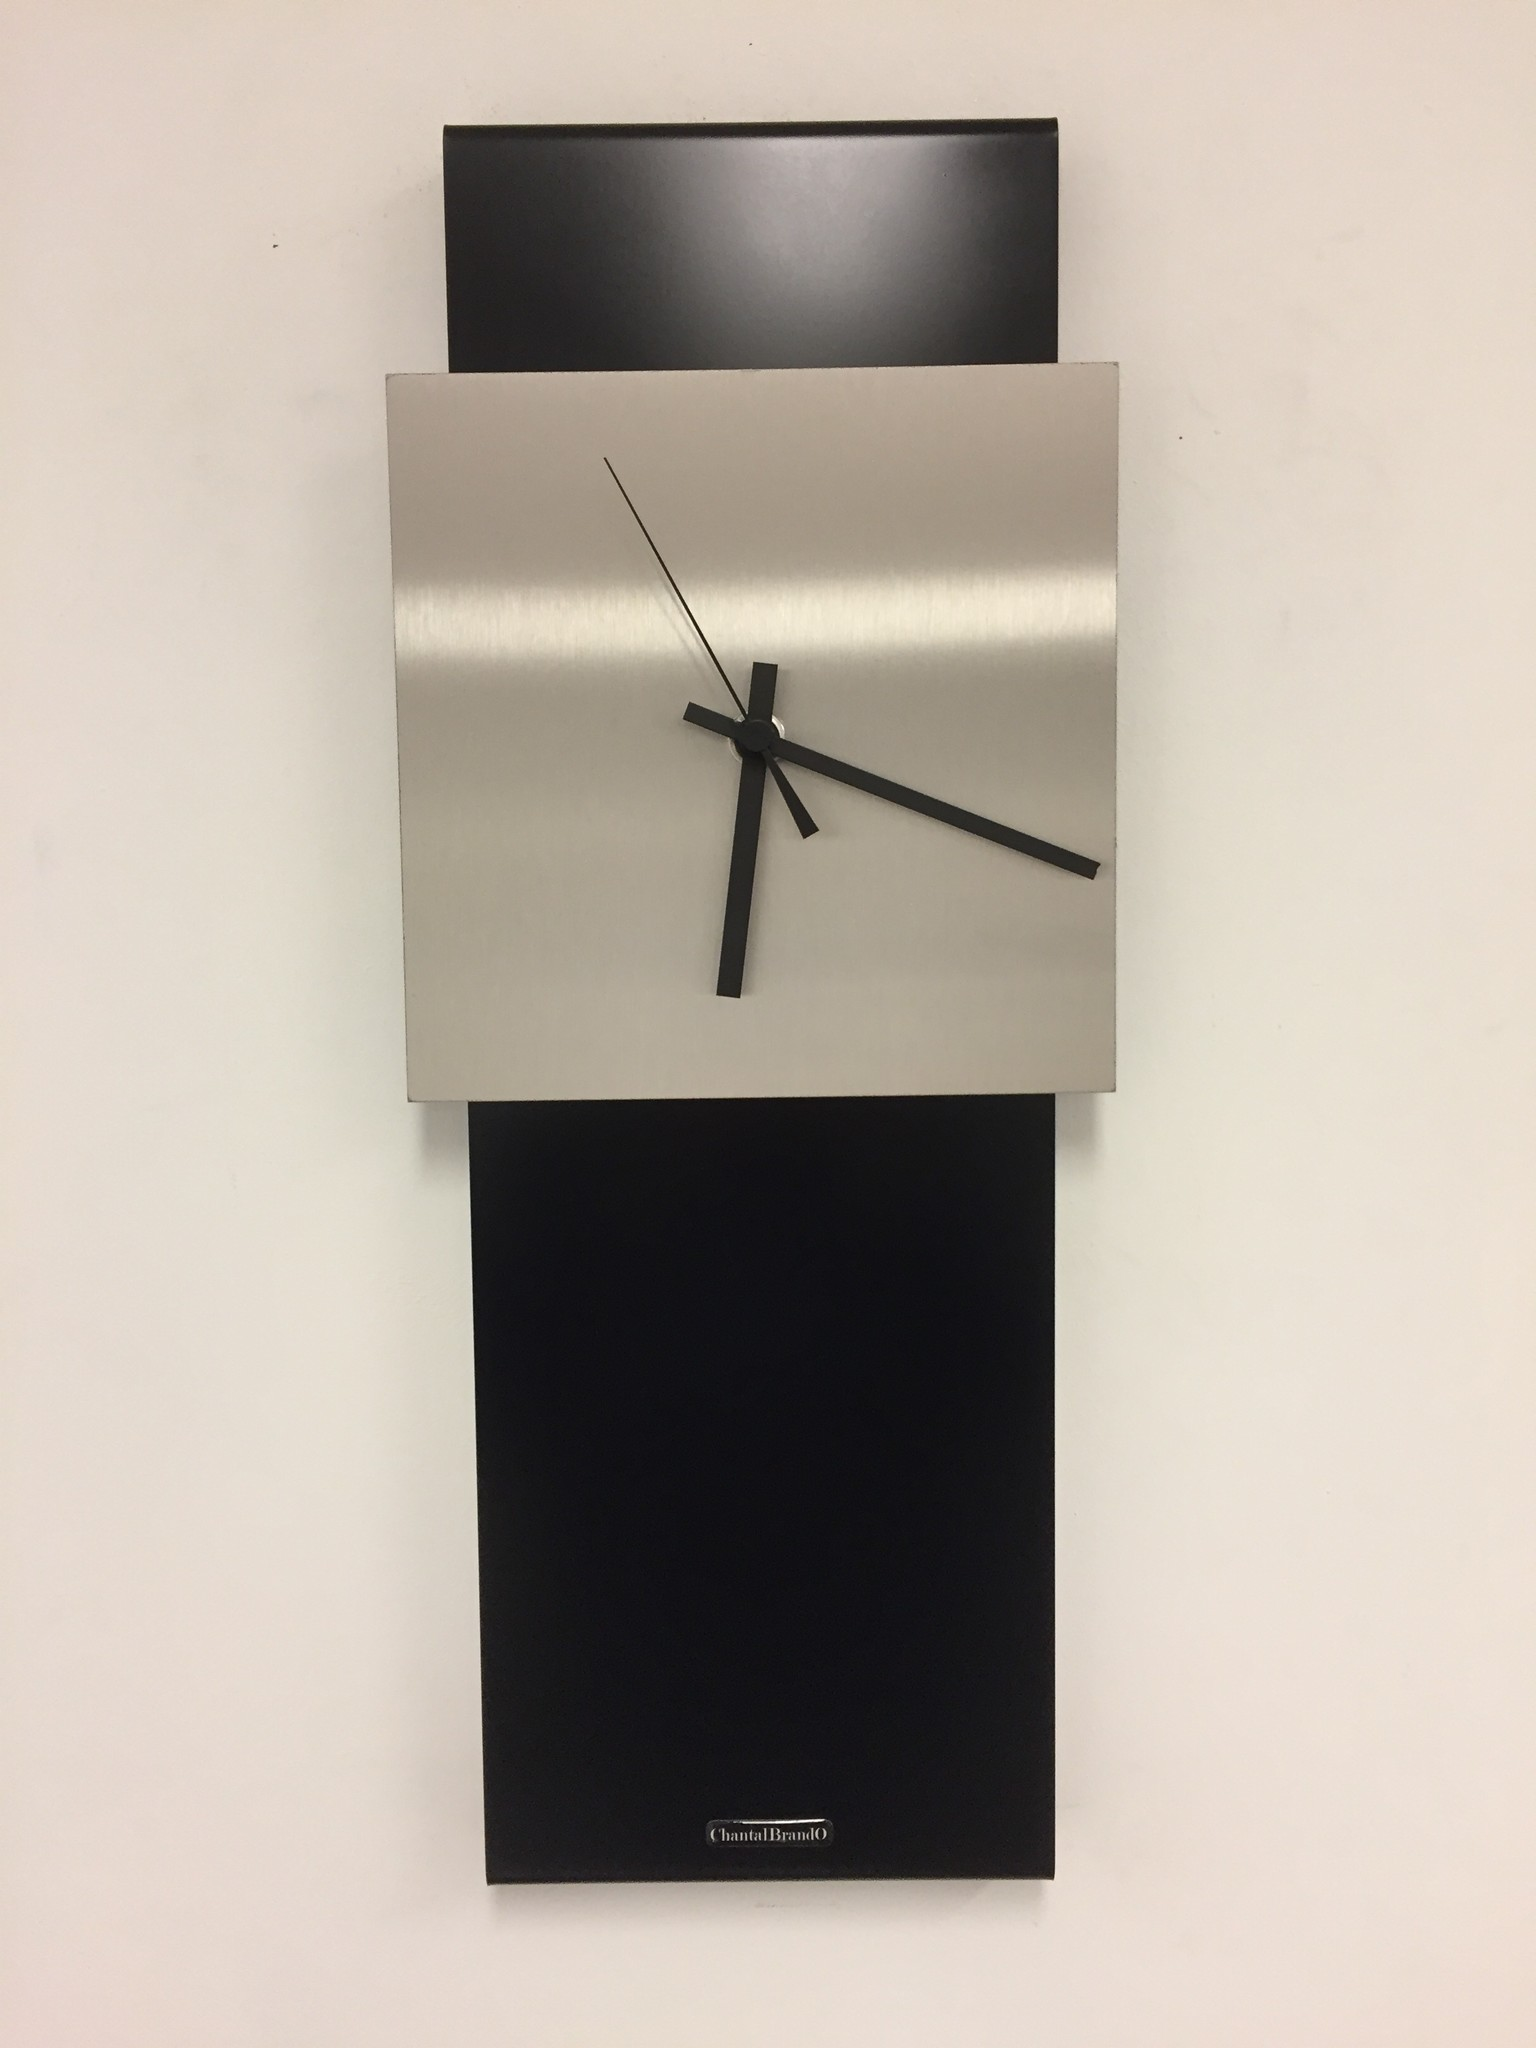 ChantalBrandO Wandklok LaBrand Export Design Black Modern Design